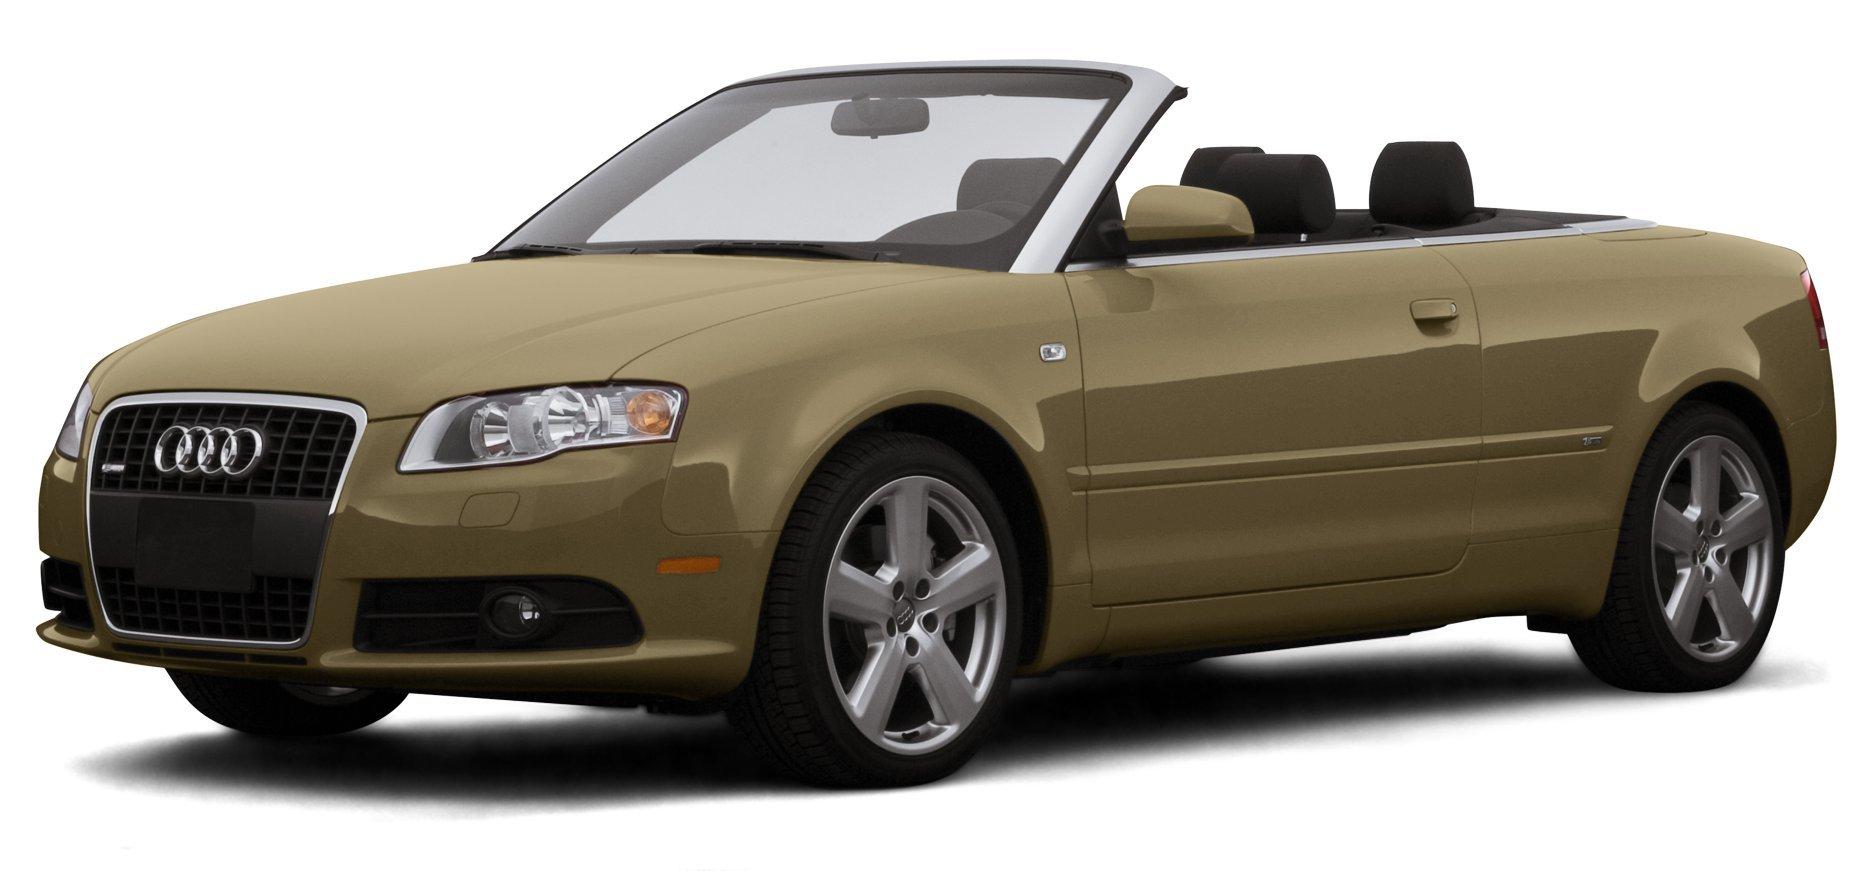 Amazoncom Audi A Quattro Reviews Images And Specs Vehicles - Audi a4 2007